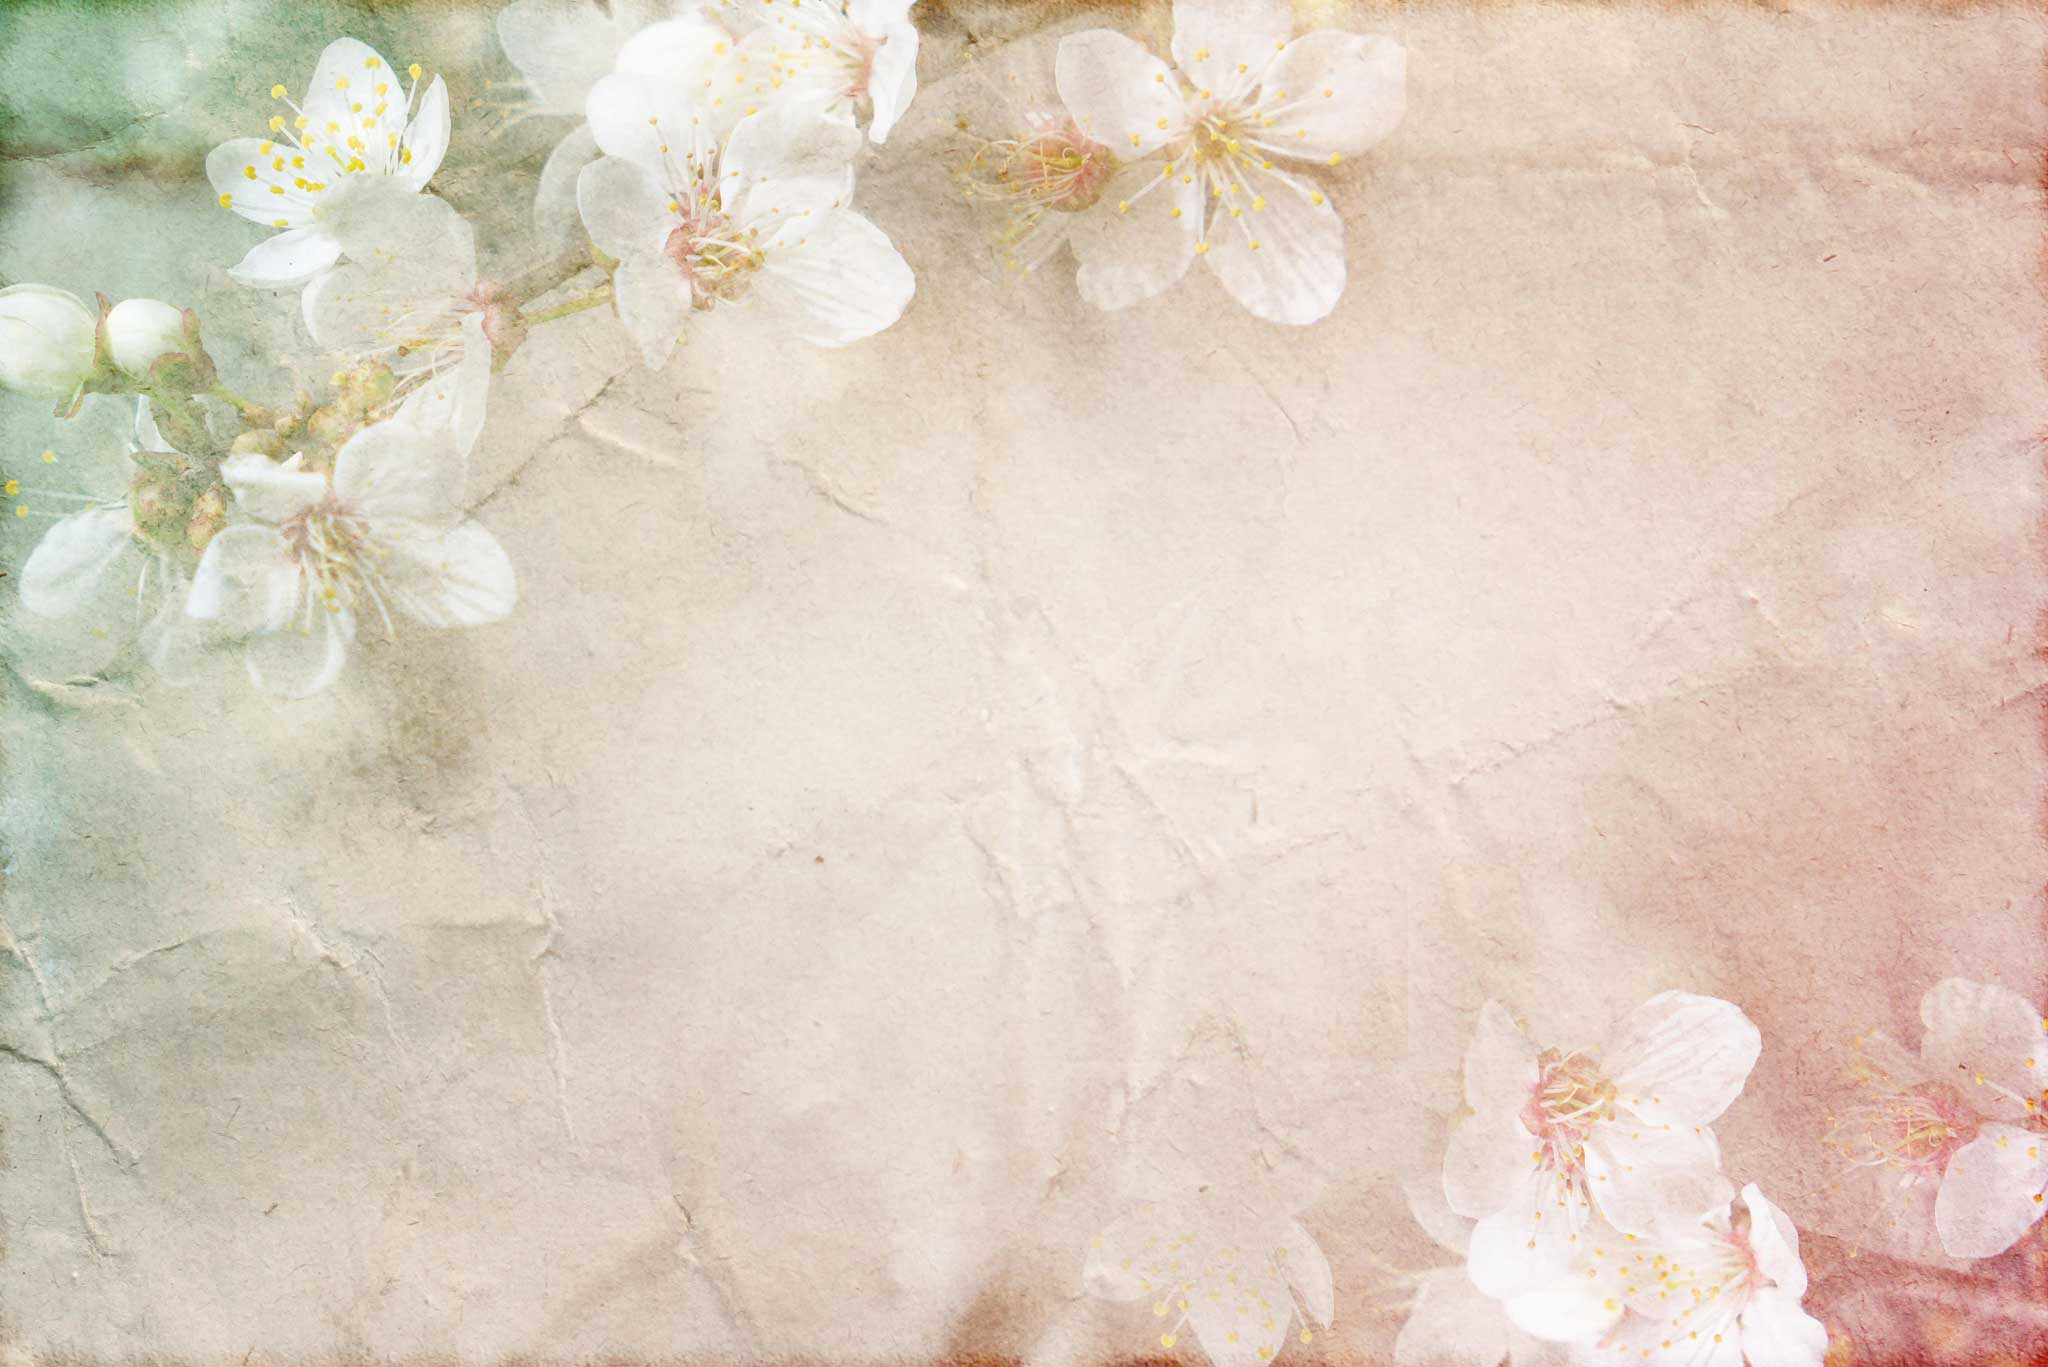 tapet-fototapet-design-decor-mural-customizabil-comanda-personalizat-bucuresti-daring-prints-motiv-model-floral-flori-cires-culori-pastel